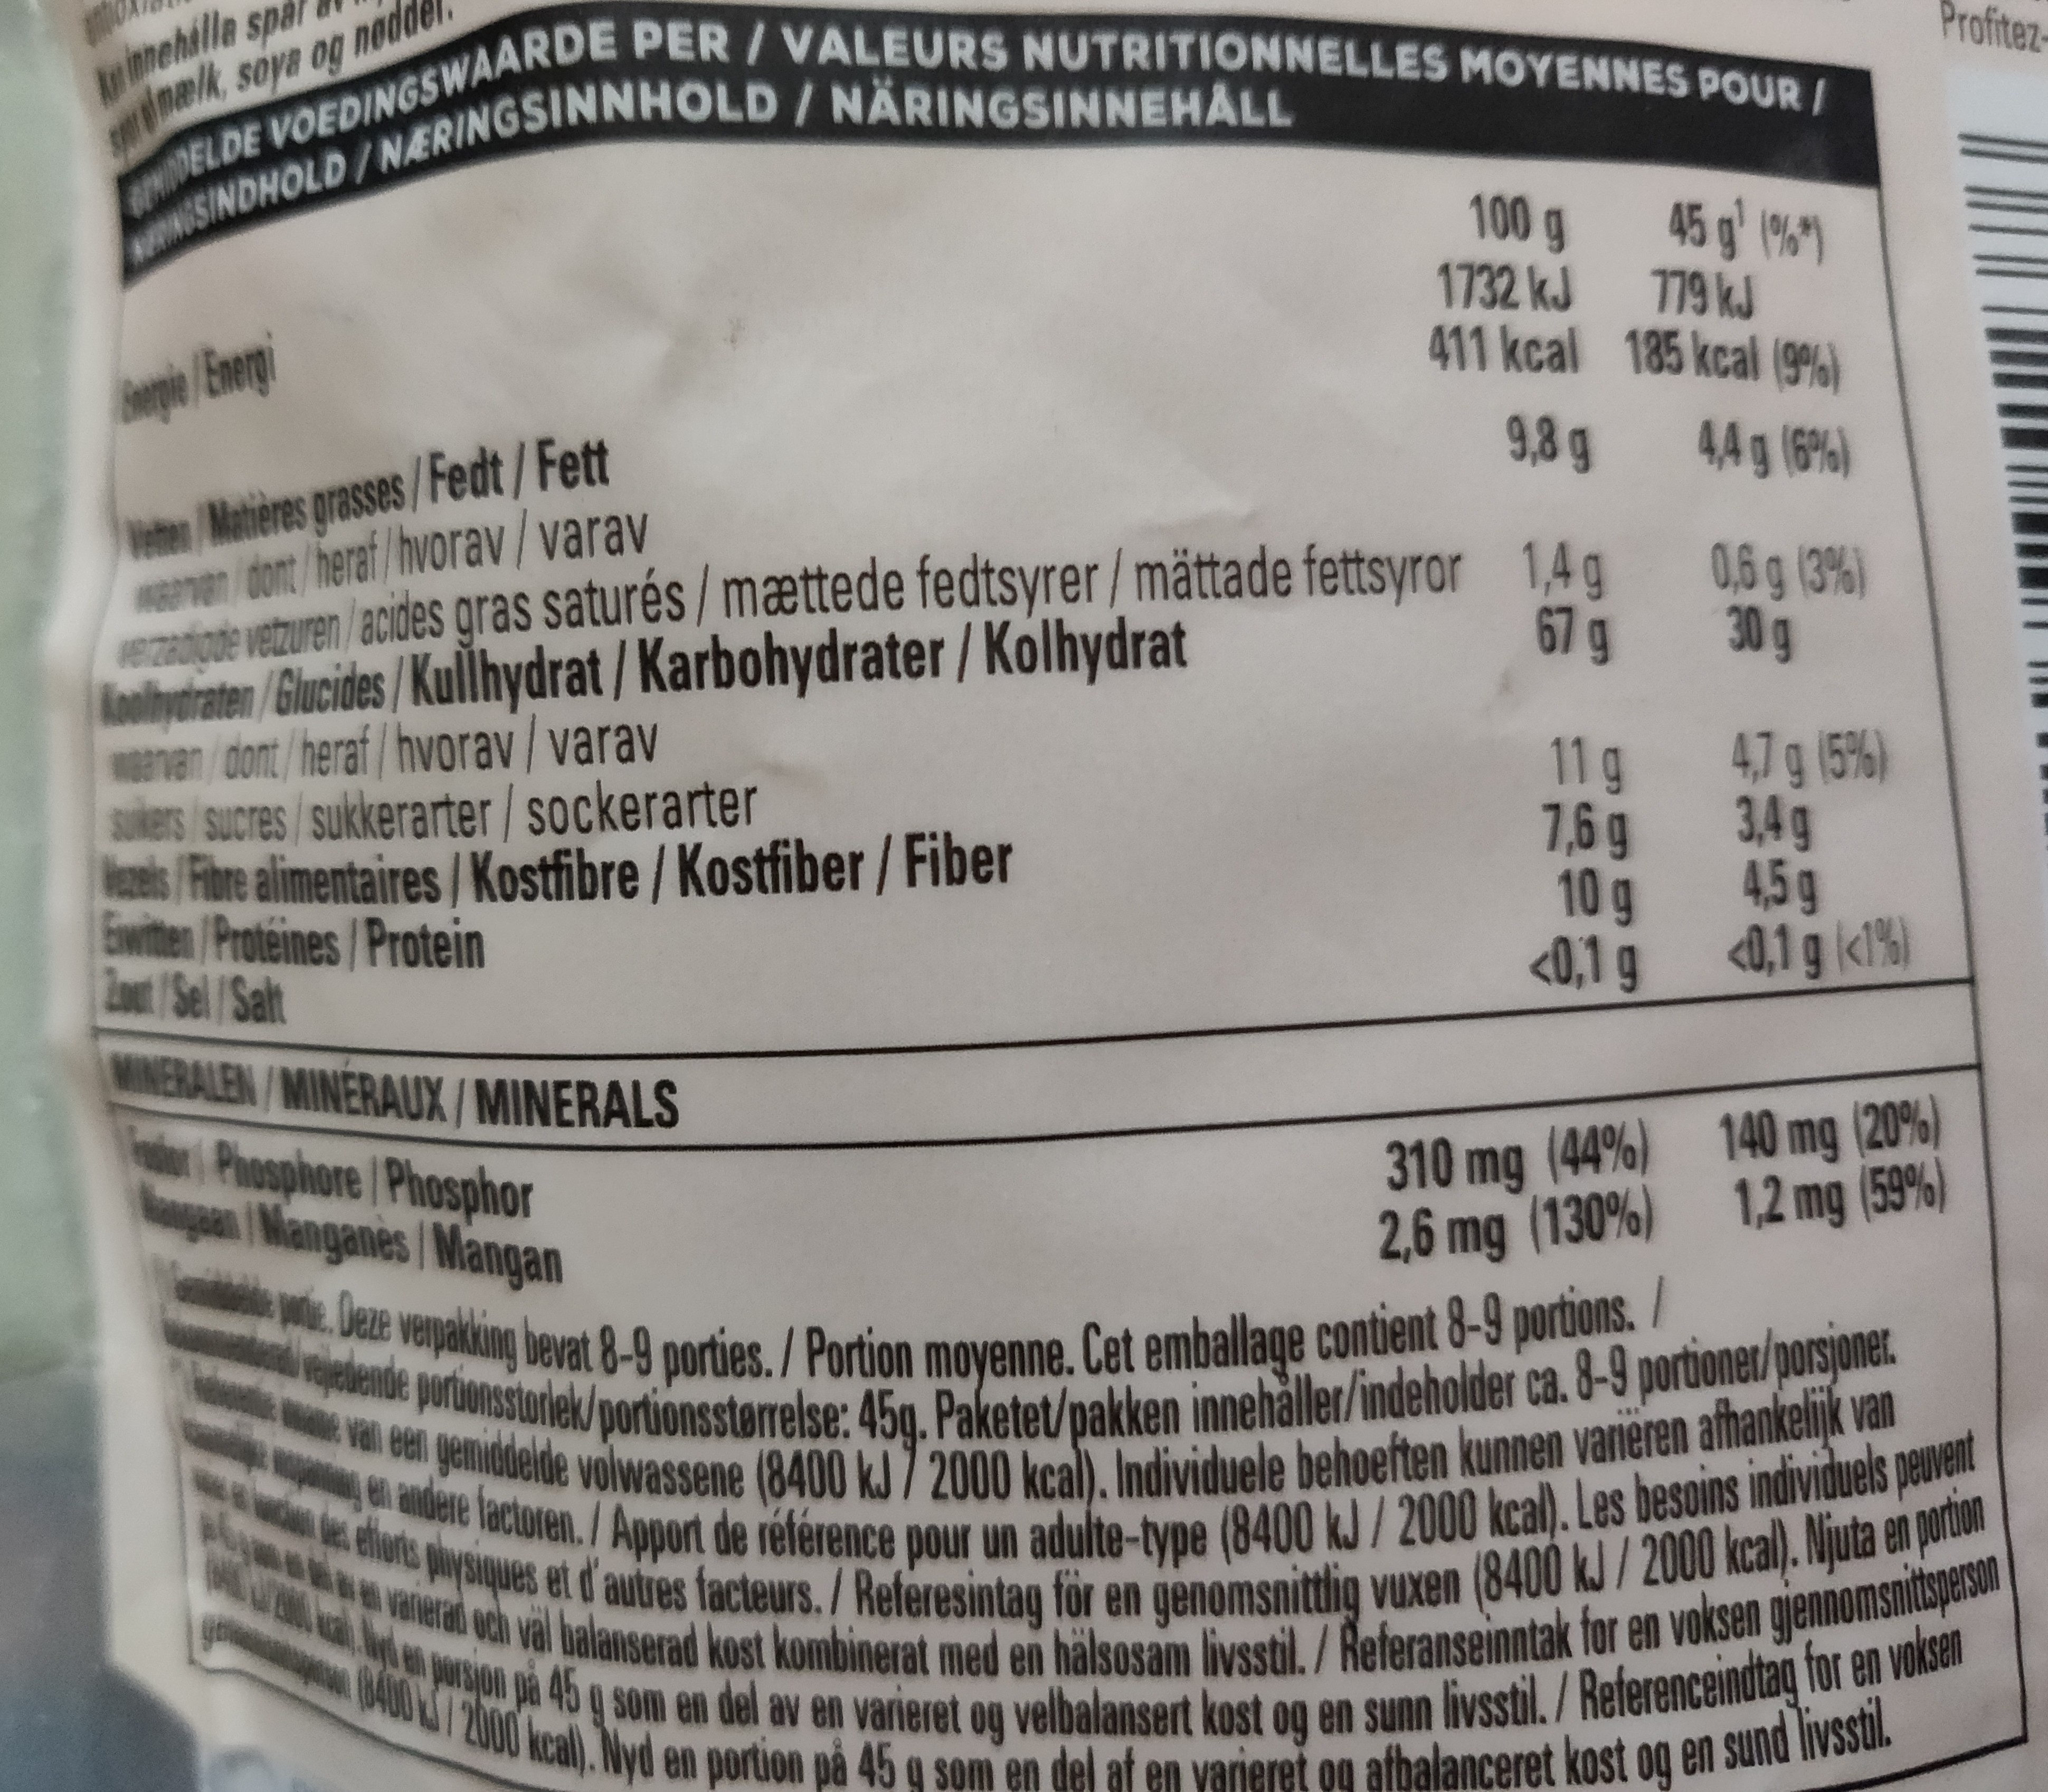 Super Goodness Nutri Boost - Informations nutritionnelles - fr